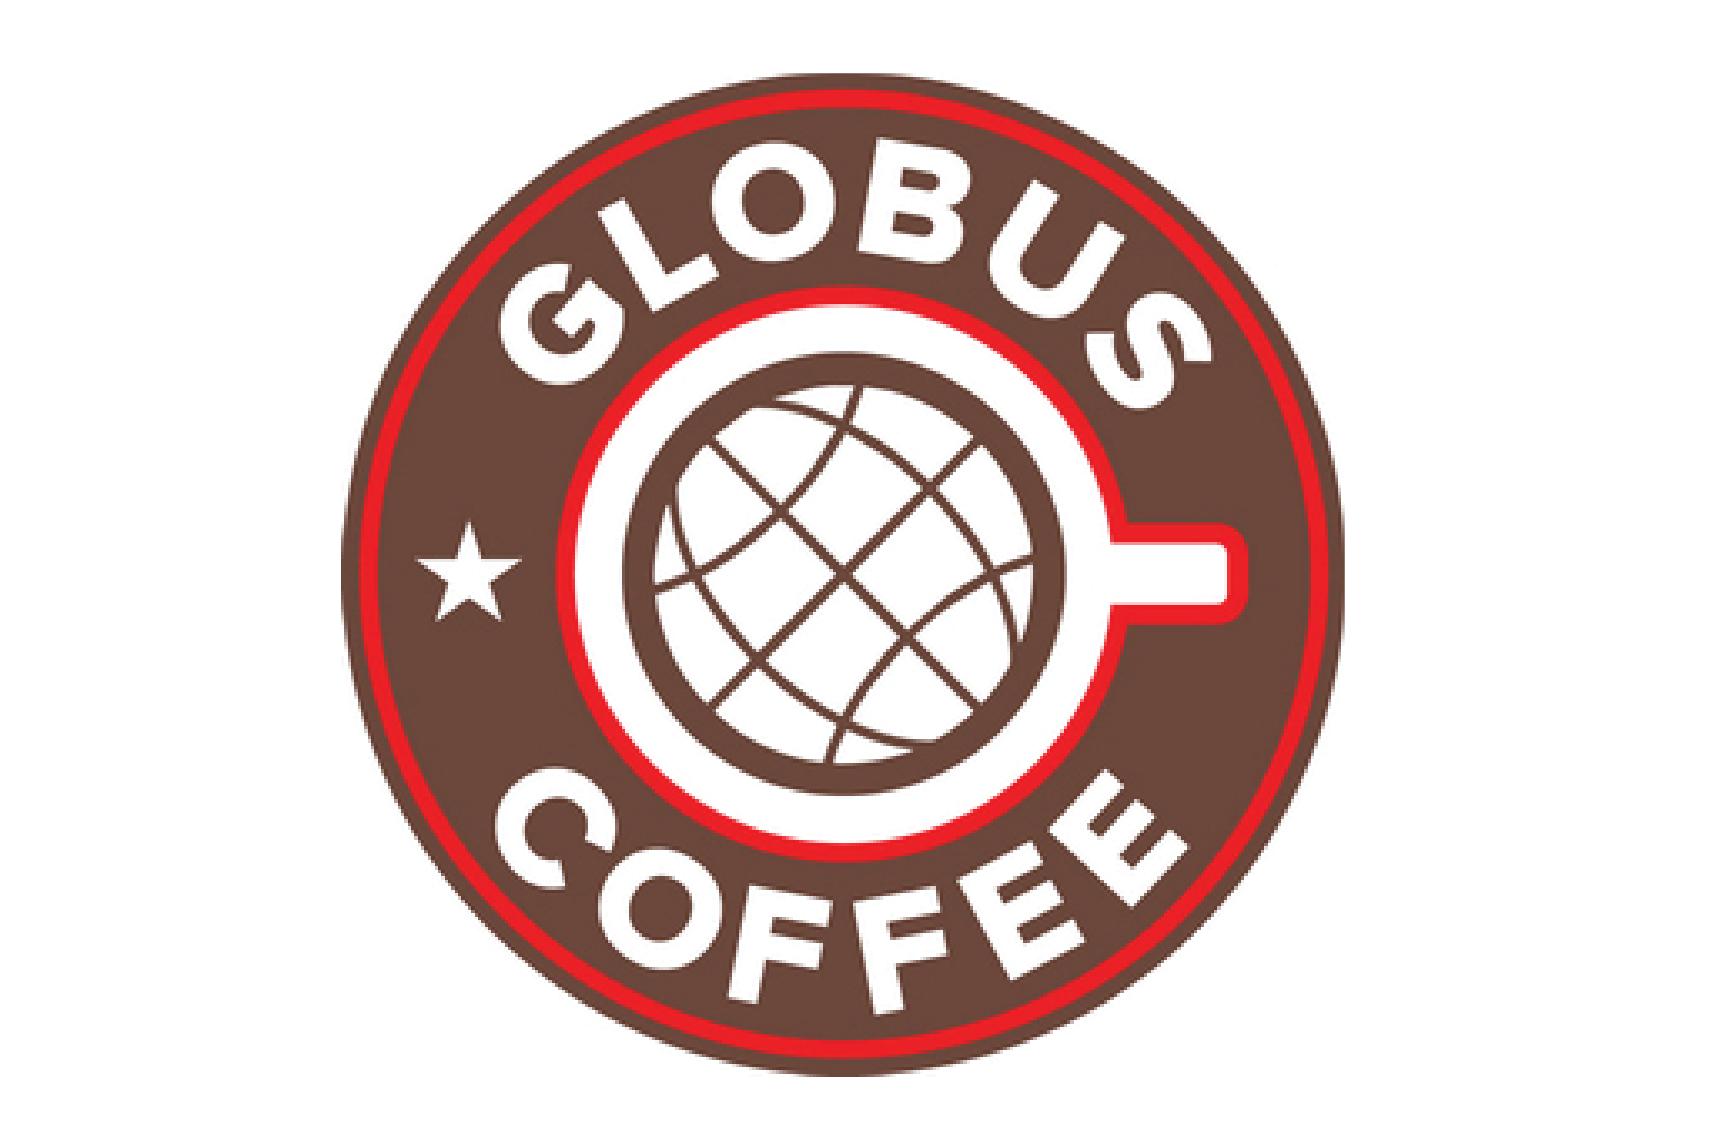 Globus Coffee